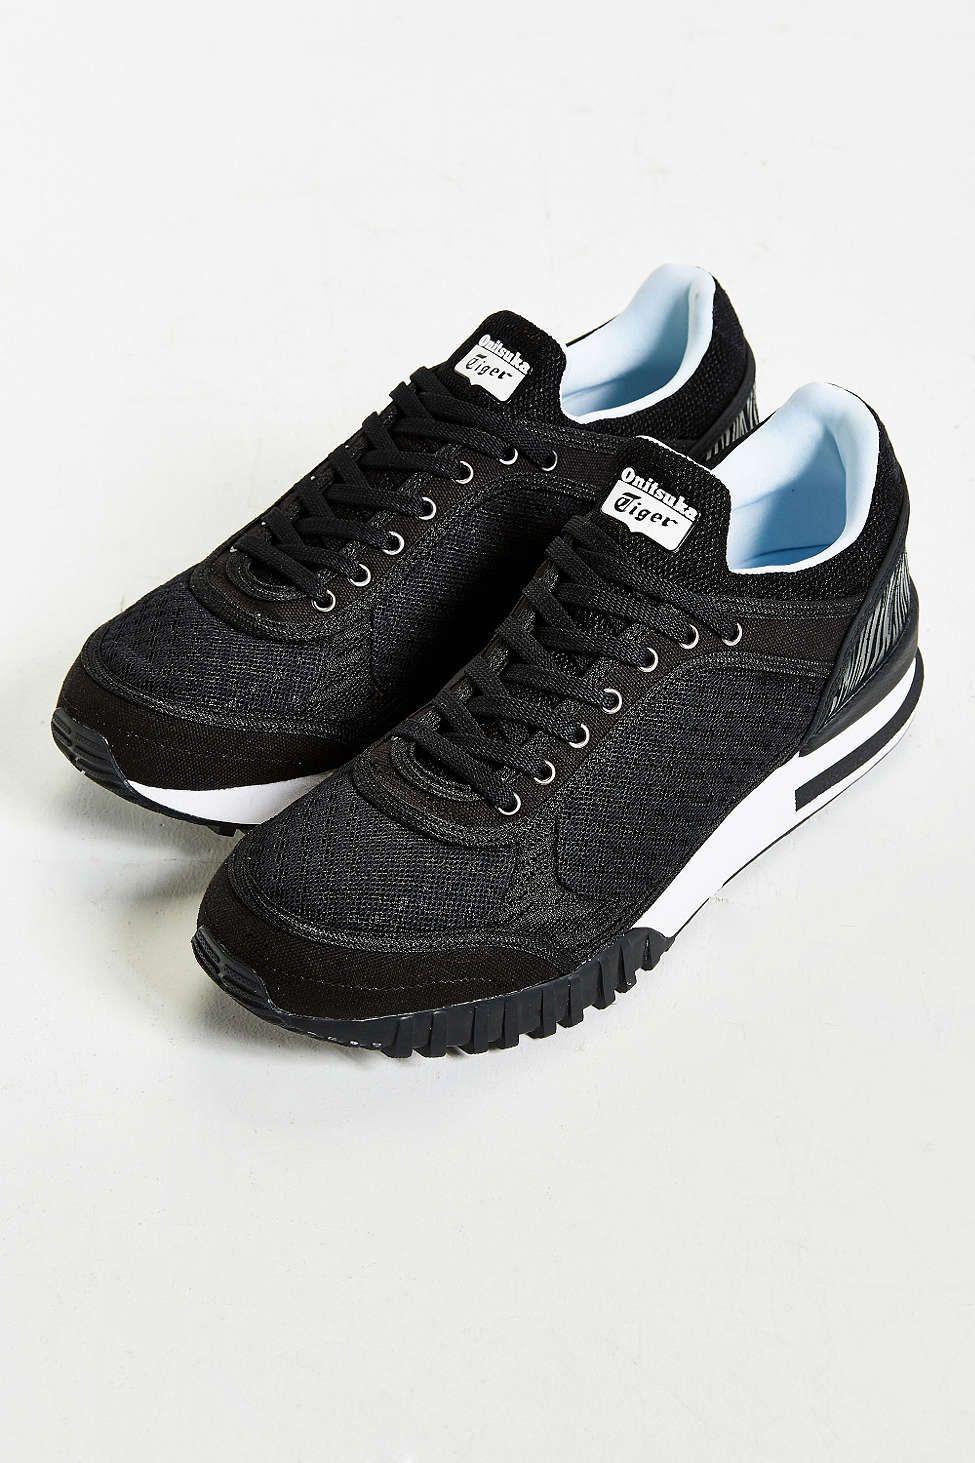 wholesale dealer 0a748 1e845 Asics Onitsuka Tiger Colorado 85 RB Sneaker | Shoes ...